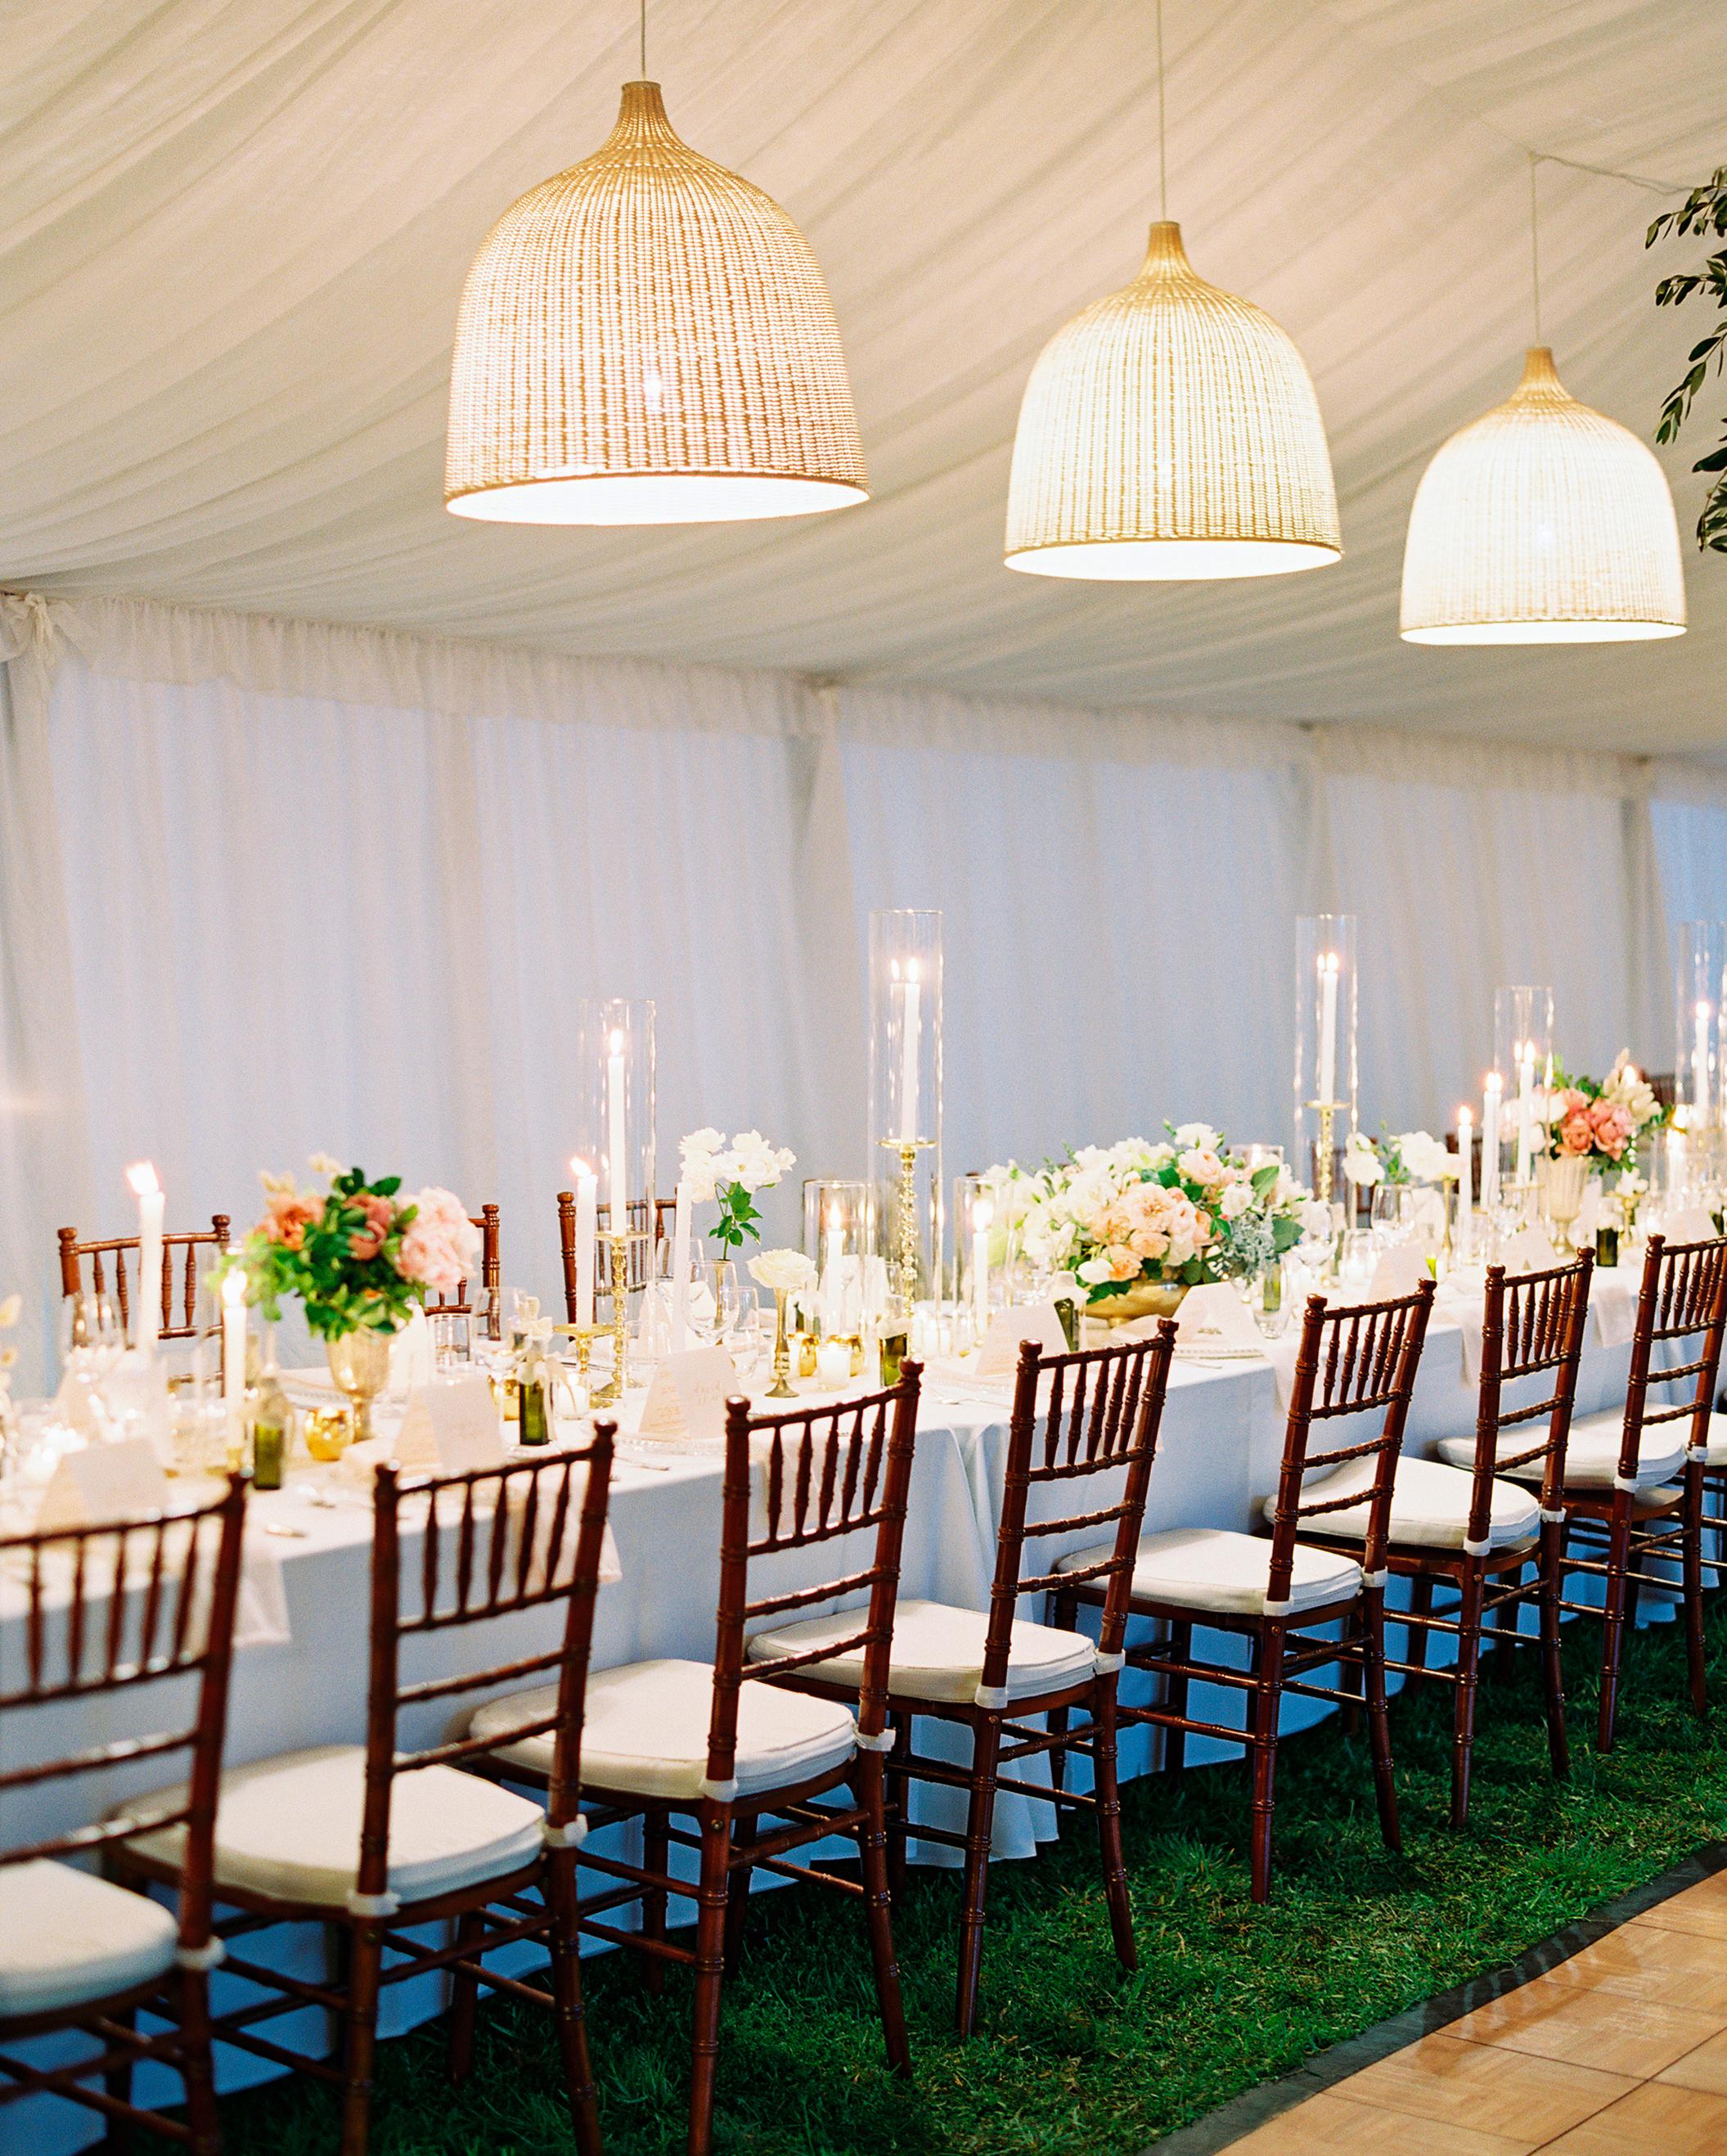 jemma-michael-wedding-tent-002639014-s112110-0815.jpg